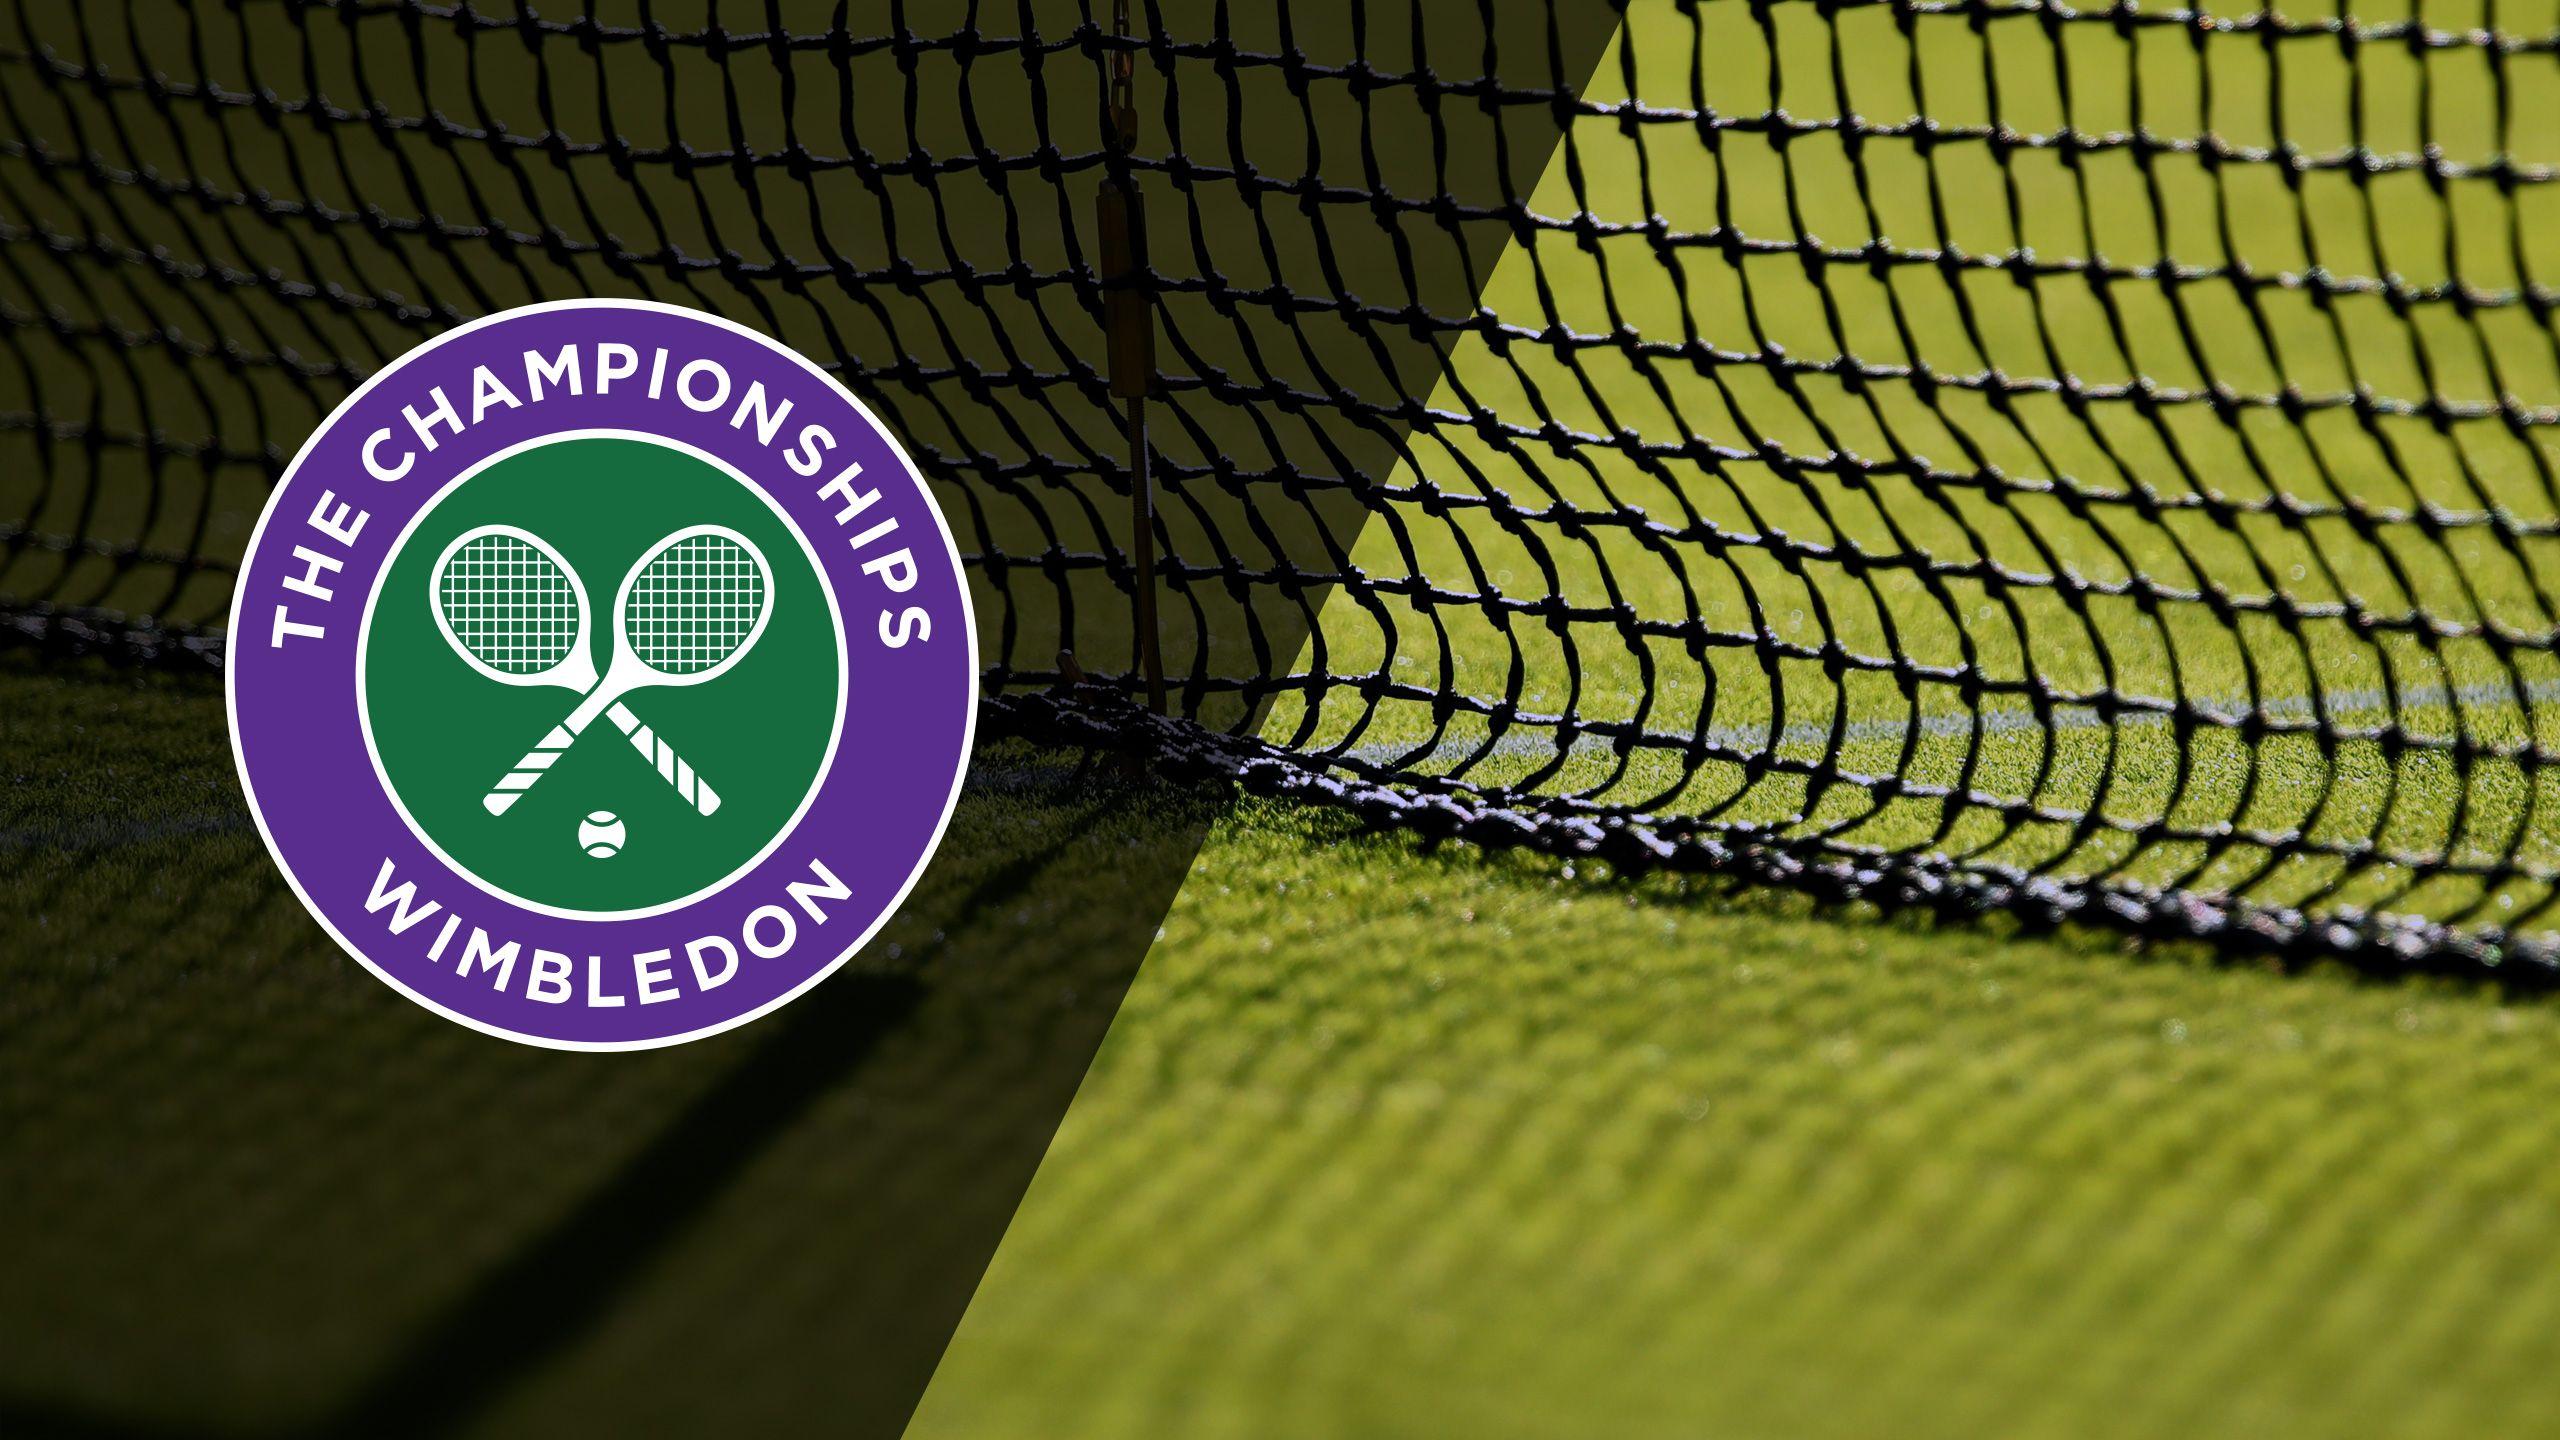 The Championships, Wimbledon 2018 (Gentlemen's Semifinals)